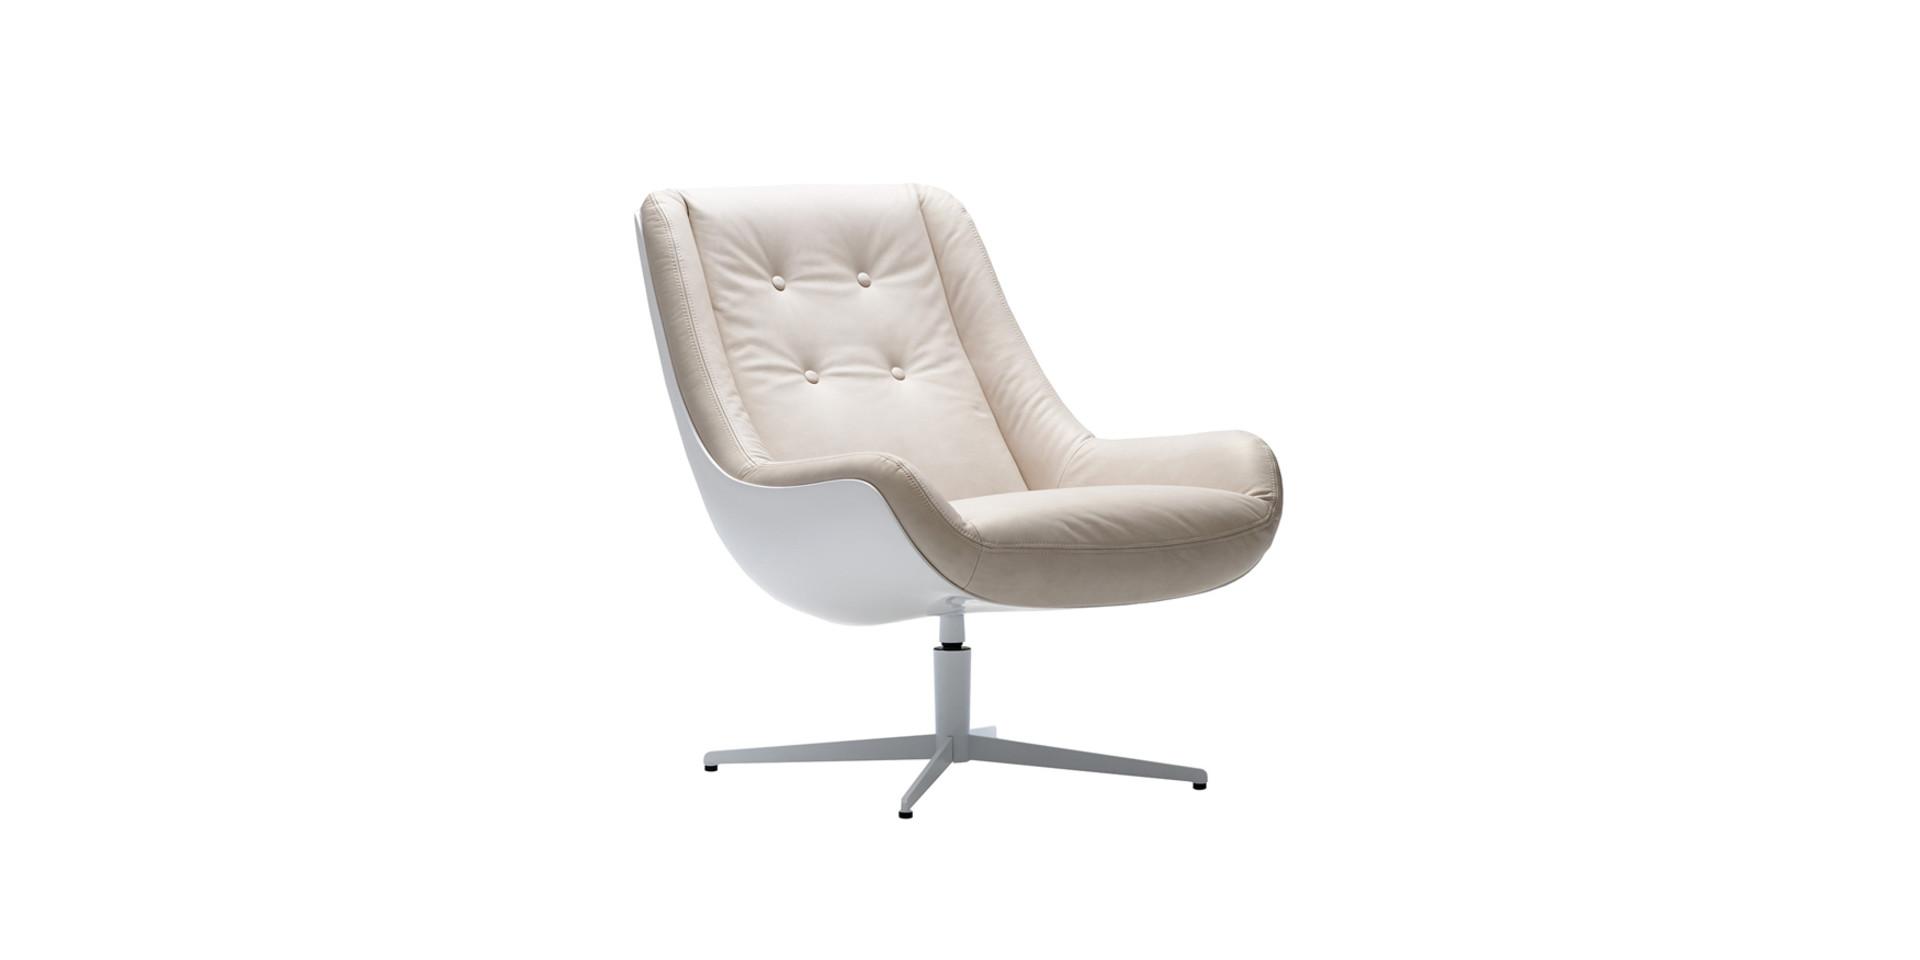 LOVEBIRD_armchair_swivel_white_buttons_aniline_nature_2